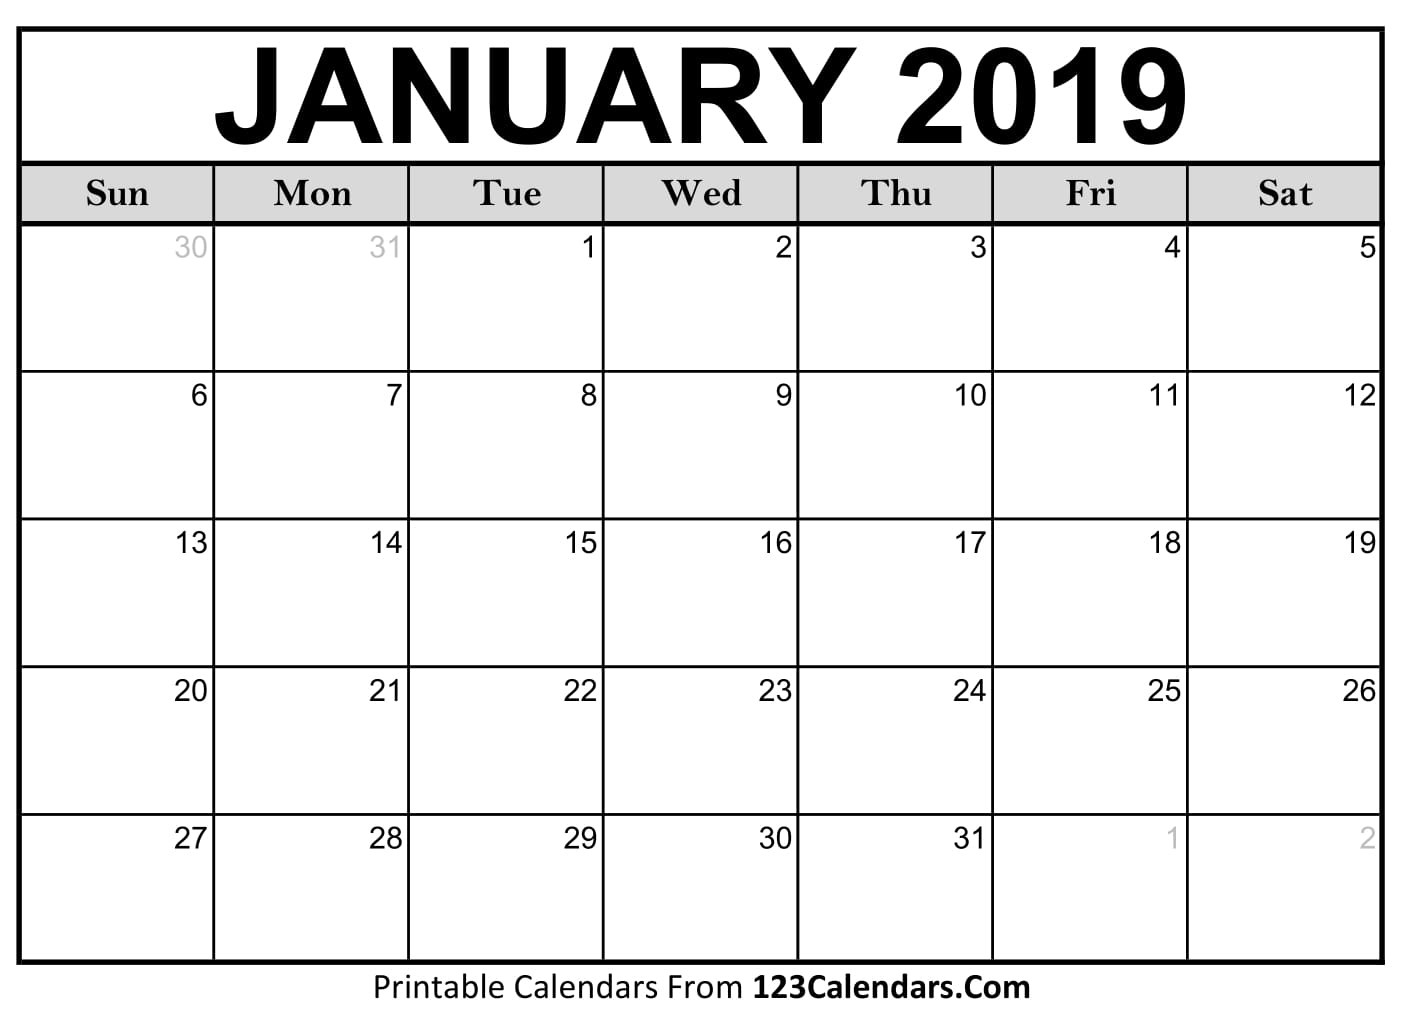 Free Printable Calendar | 123Calendars-January 2020 Calendar New Zealand